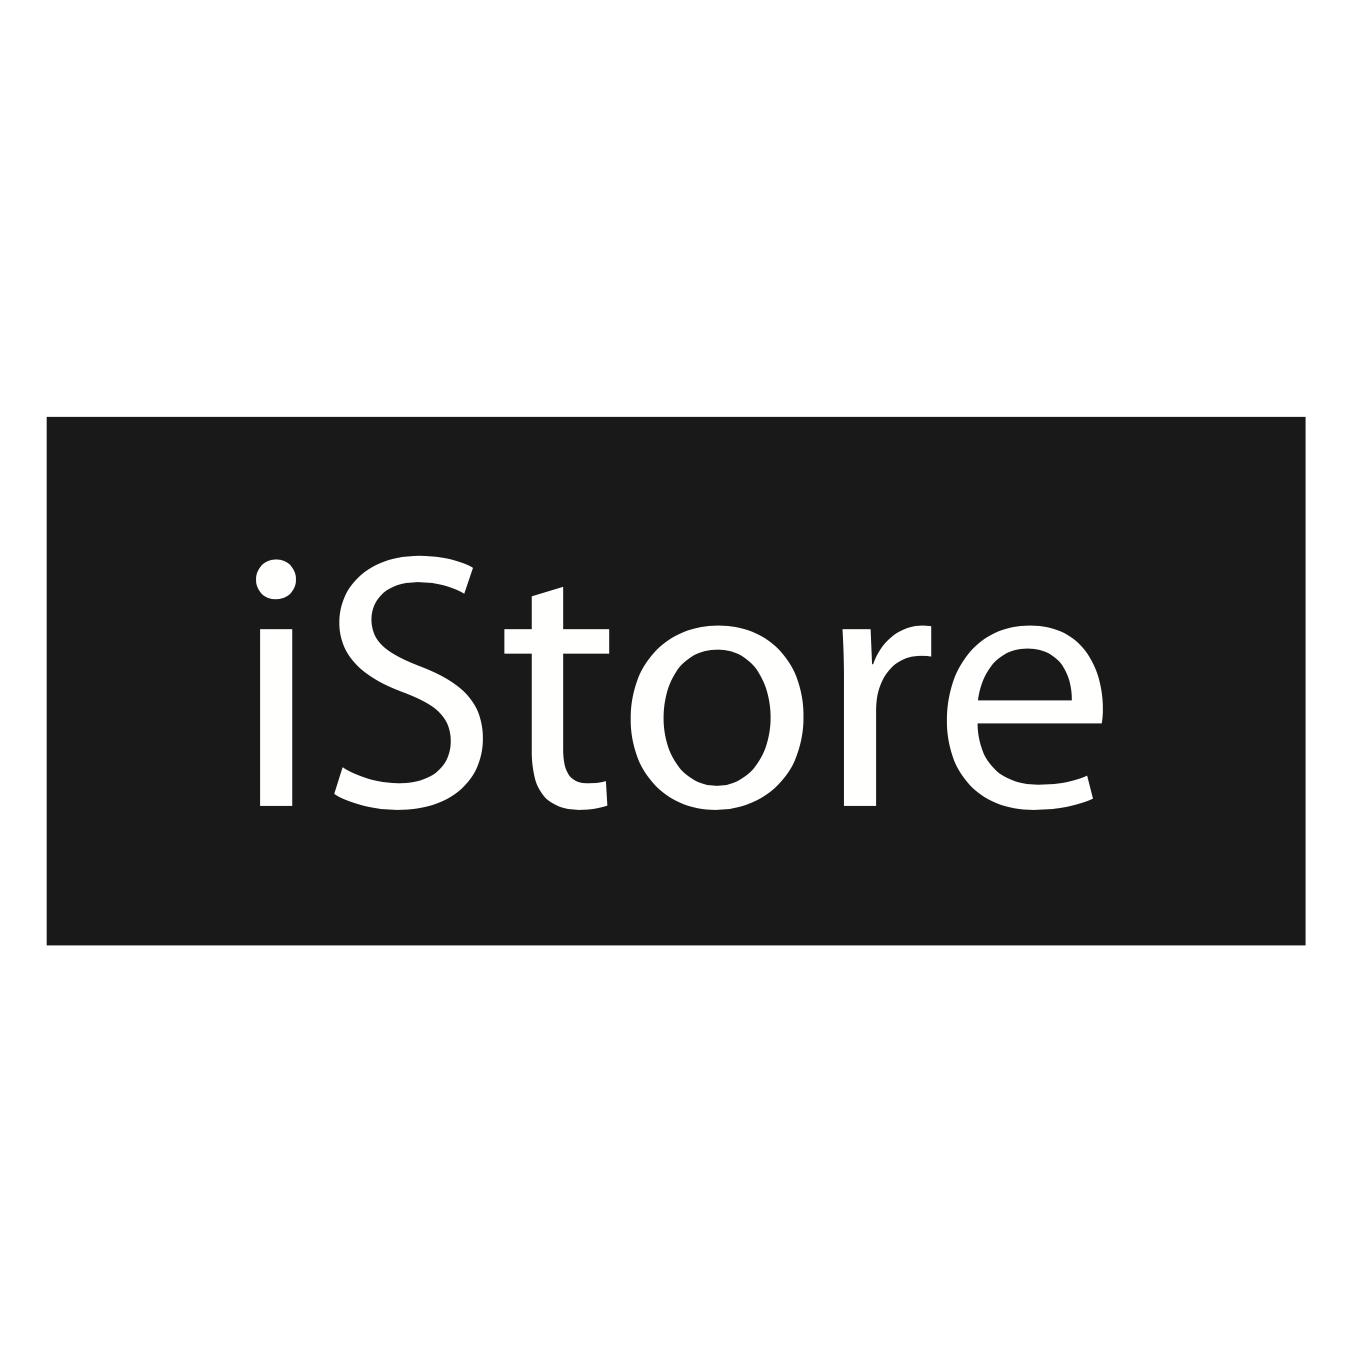 iPhone SE 16GB - Silver